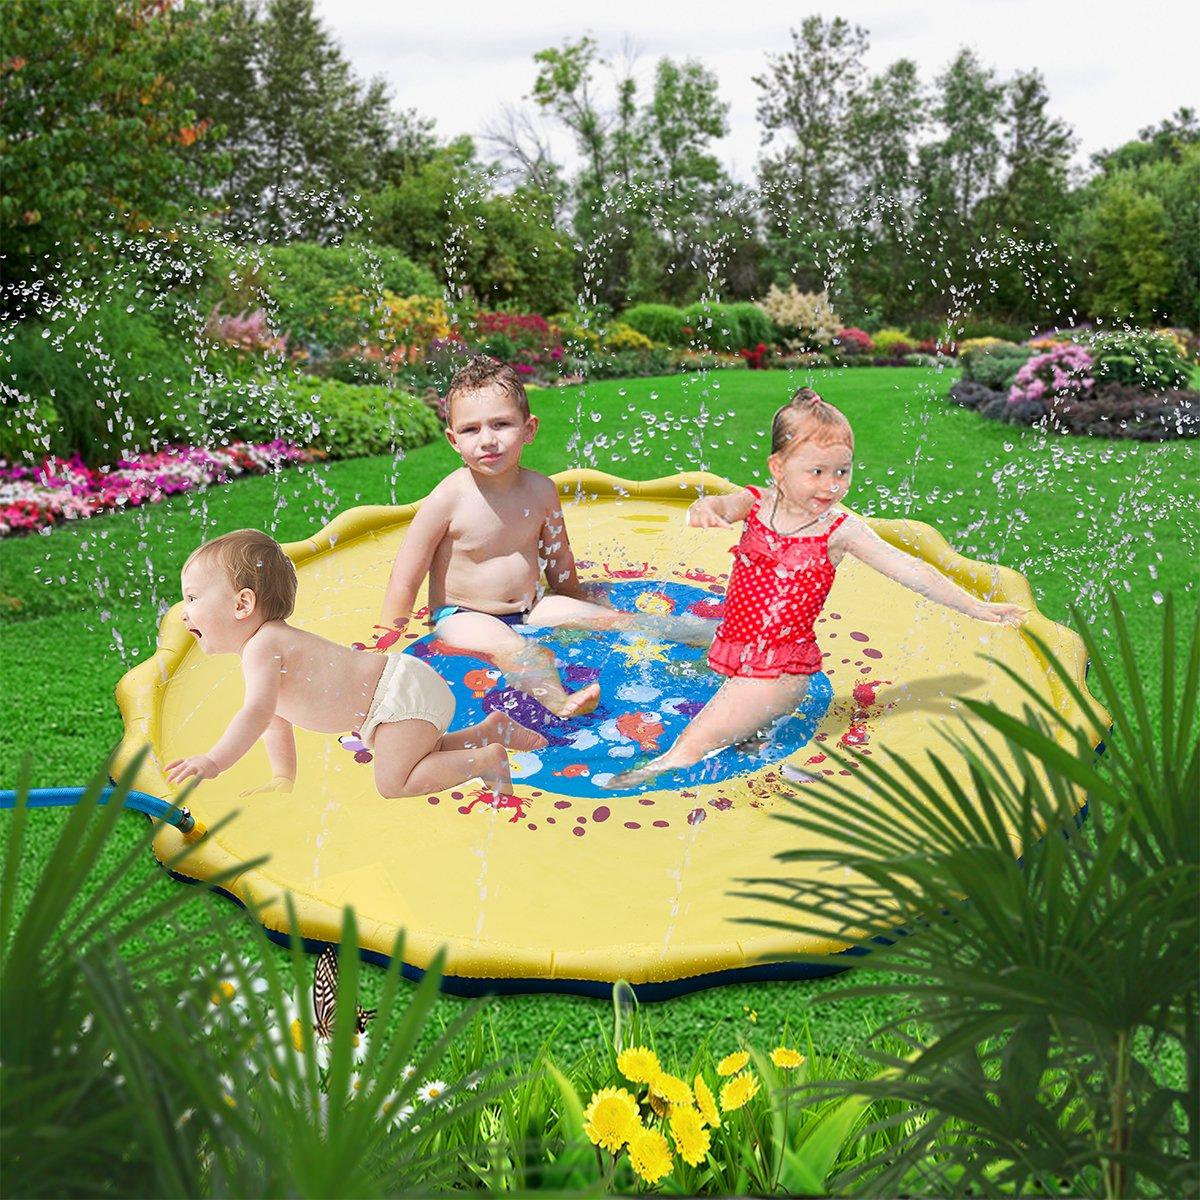 HALOFUN 67in-Diameter Sprinkle and Splash Play Mat for Kids (Yellow) by HALOFUN (Image #7)